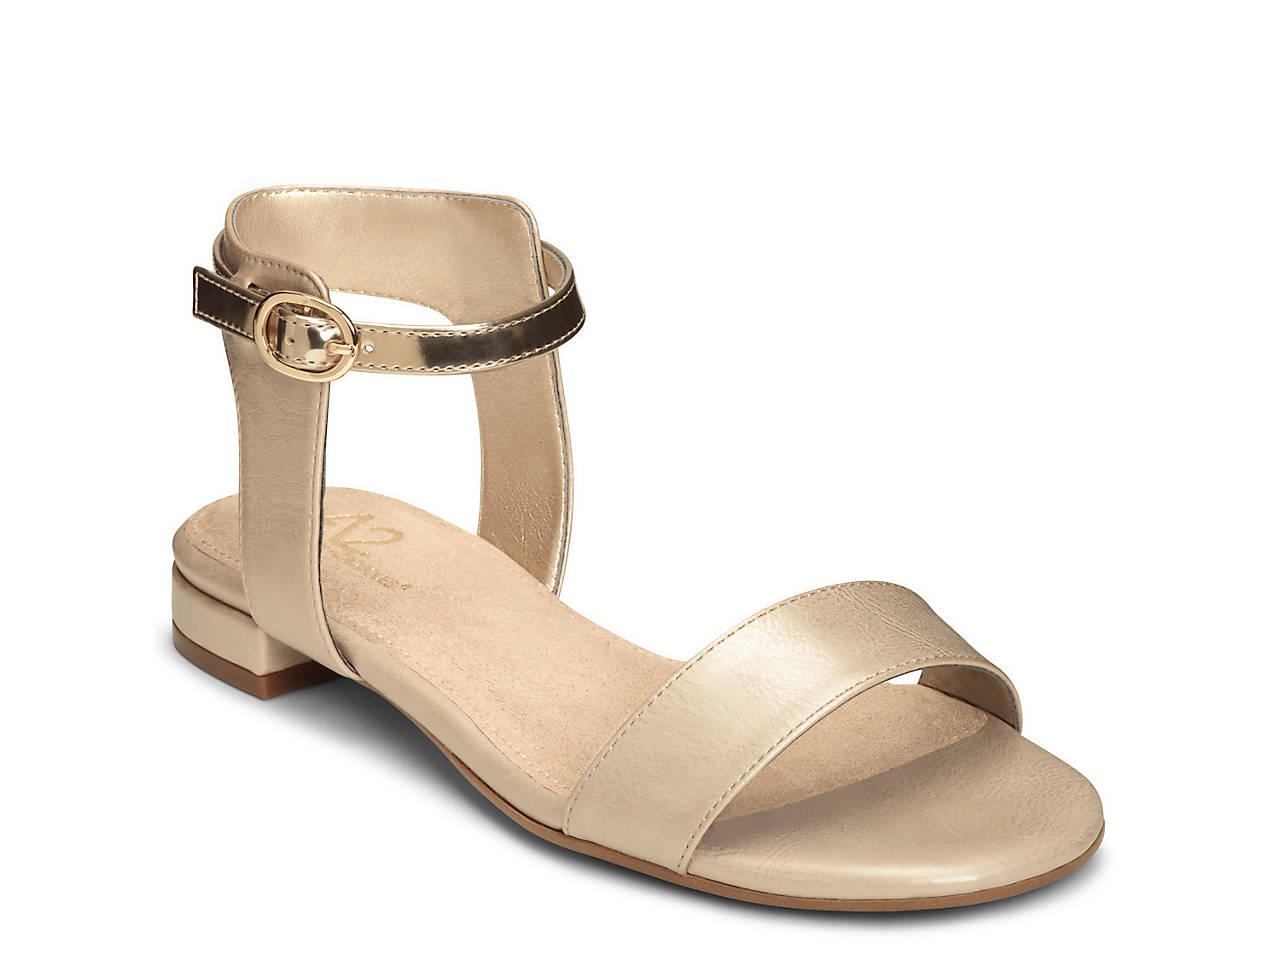 7188226c1f7f A2 by Aerosoles Down Under Sandal Women s Shoes